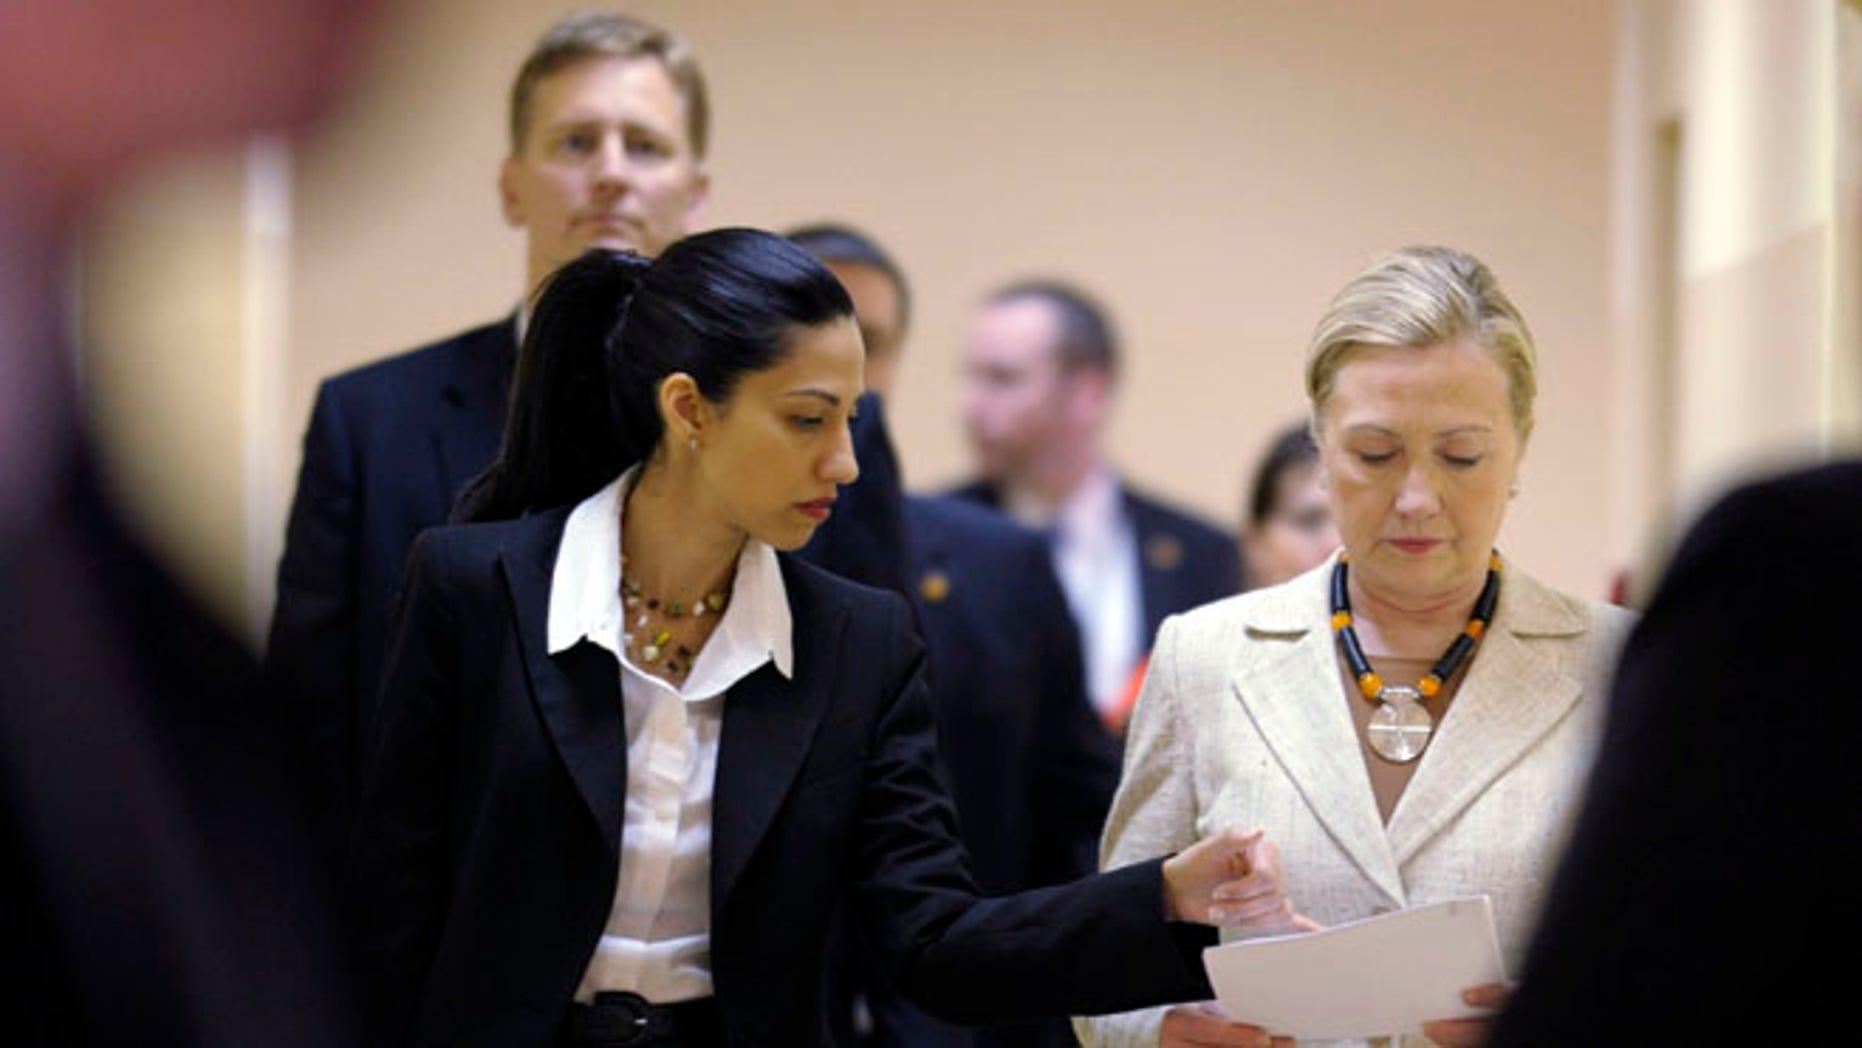 FILE: June 11, 2011: Huma Abedin with then-Secretary of State Hillary Clinton, Lusaka, Africa.